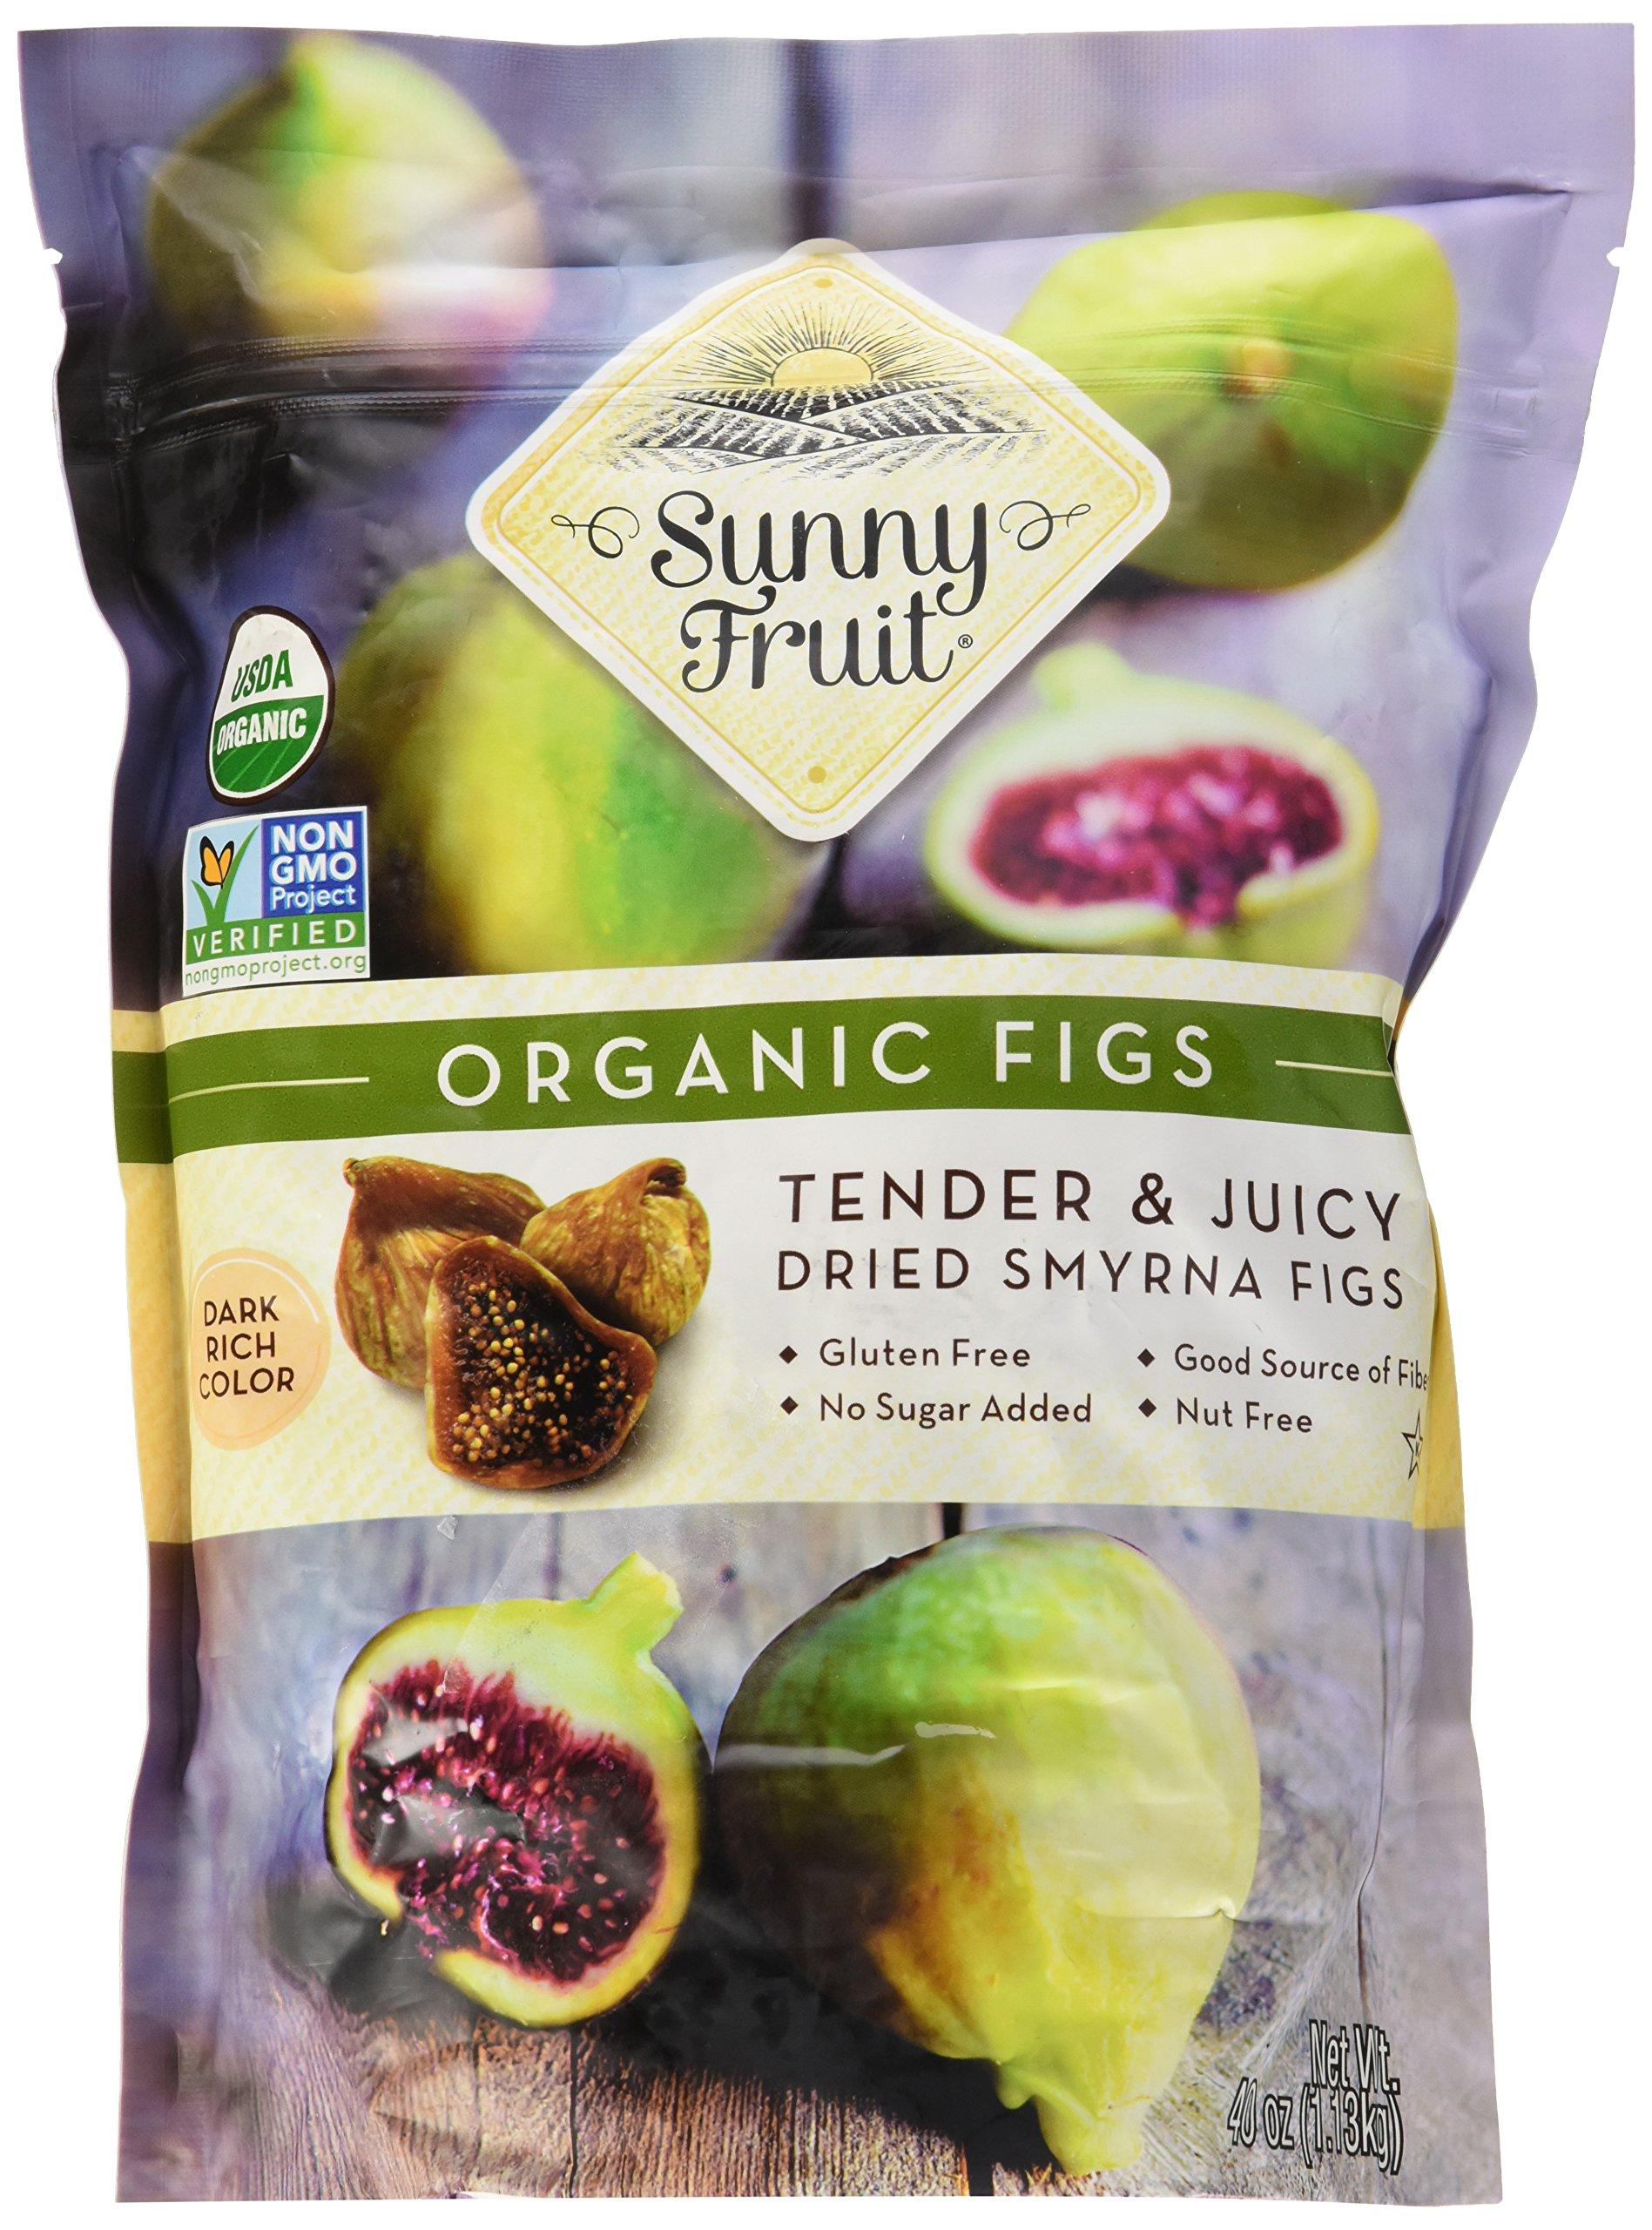 ORGANIC FIGS USDA ORGANIC SUNNY FRUIT 40 OUNCE BAG